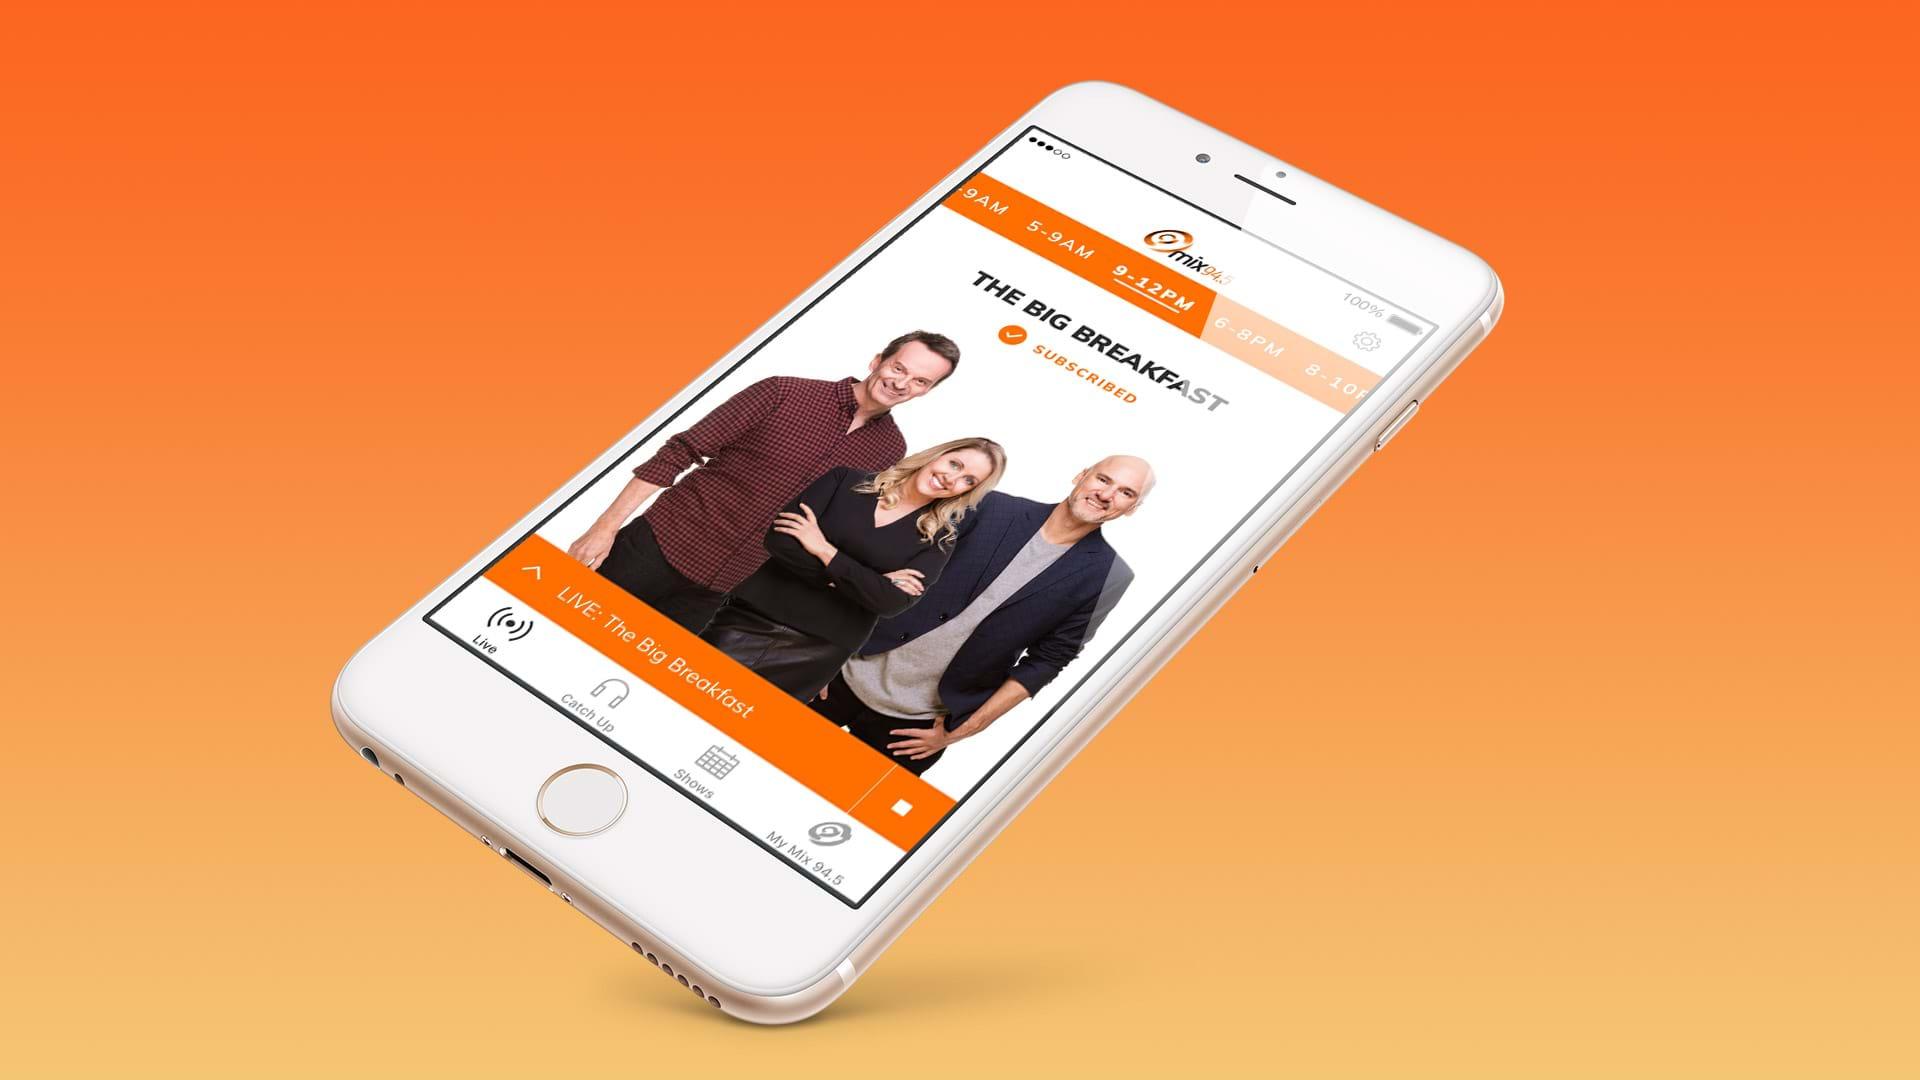 Mix94.5 app